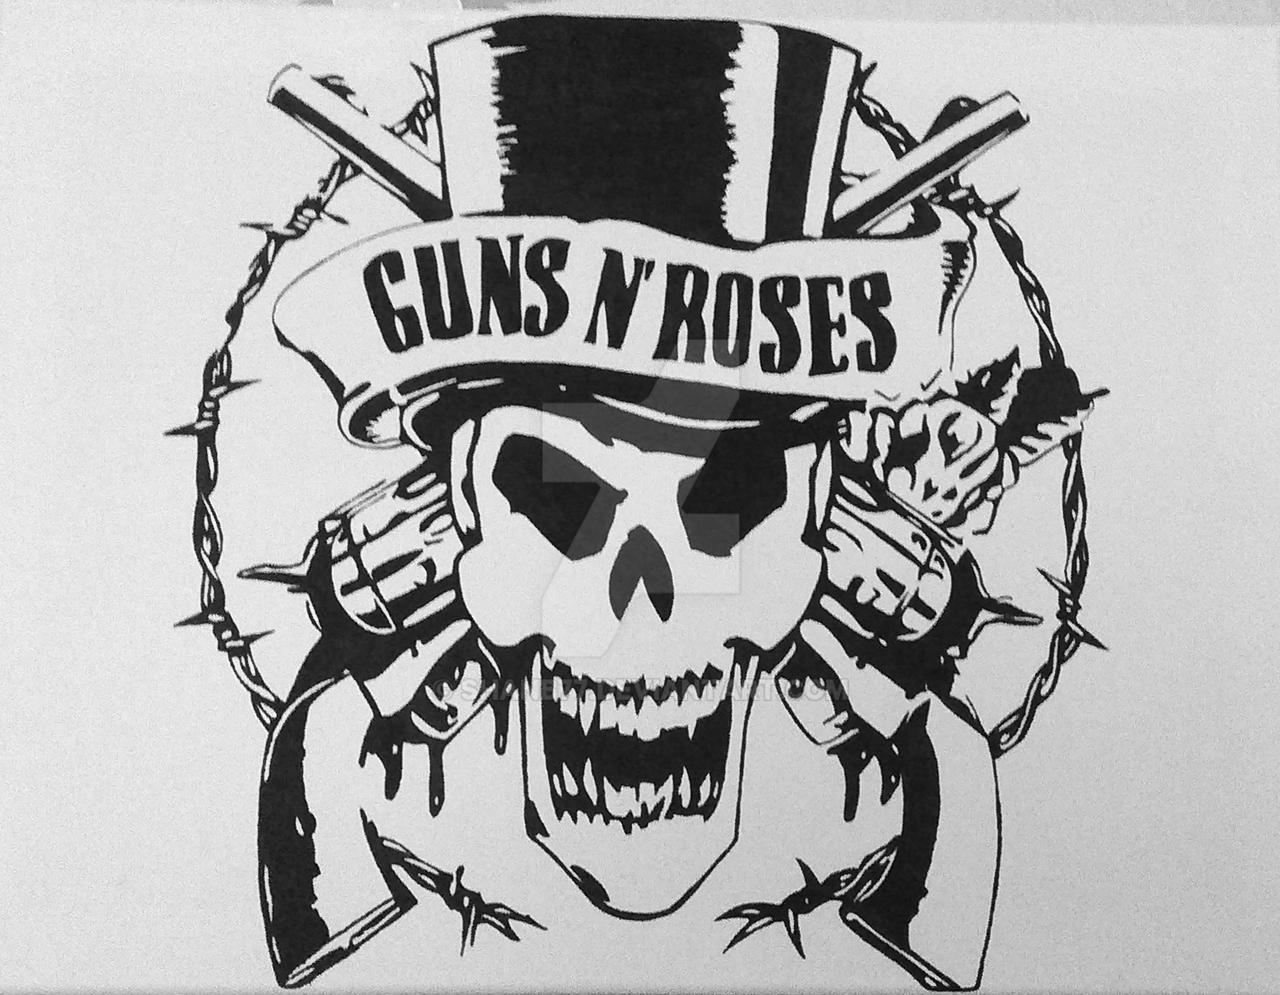 Guns n Roses logo by Shanb77 on DeviantArt